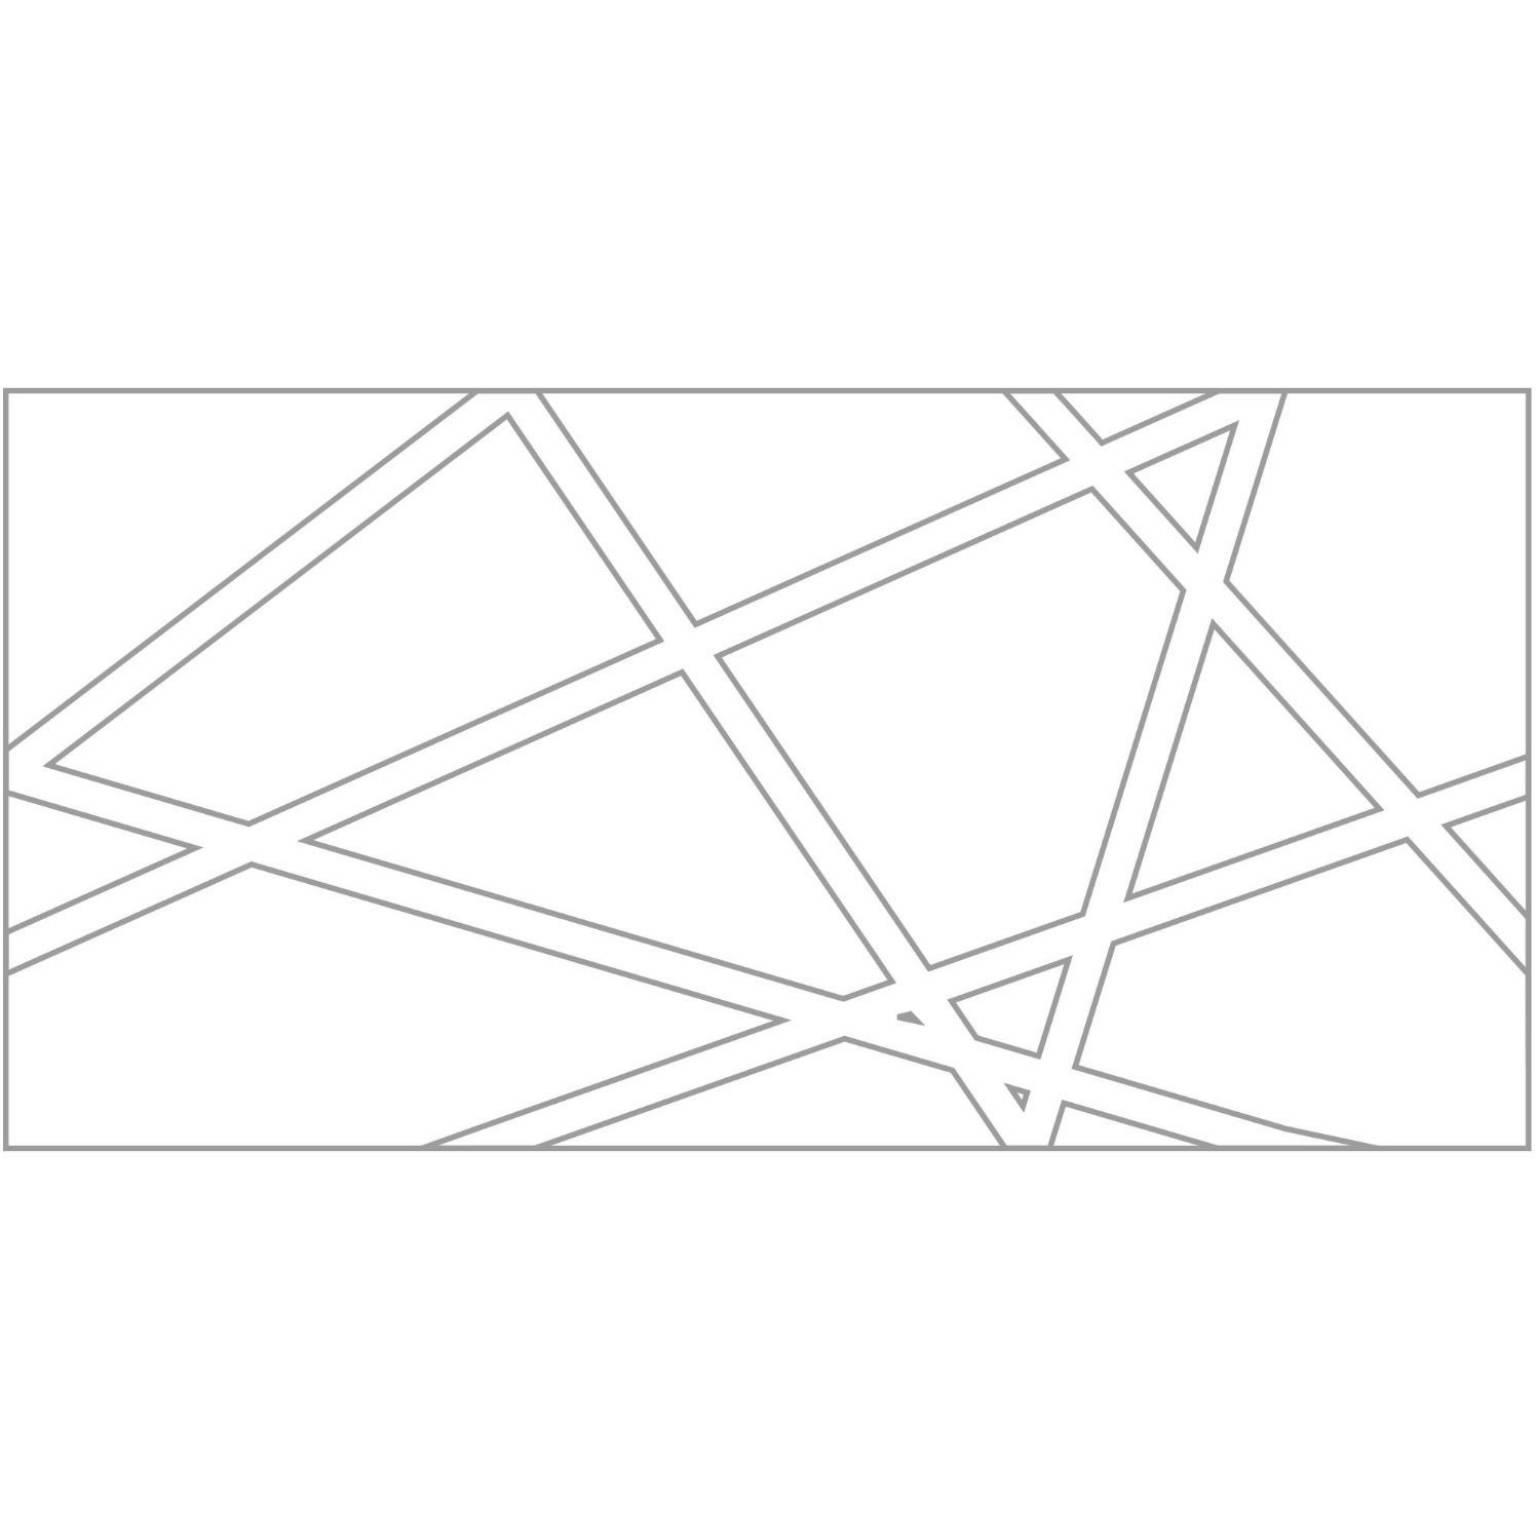 Mod. Tc-17 | Duralmond